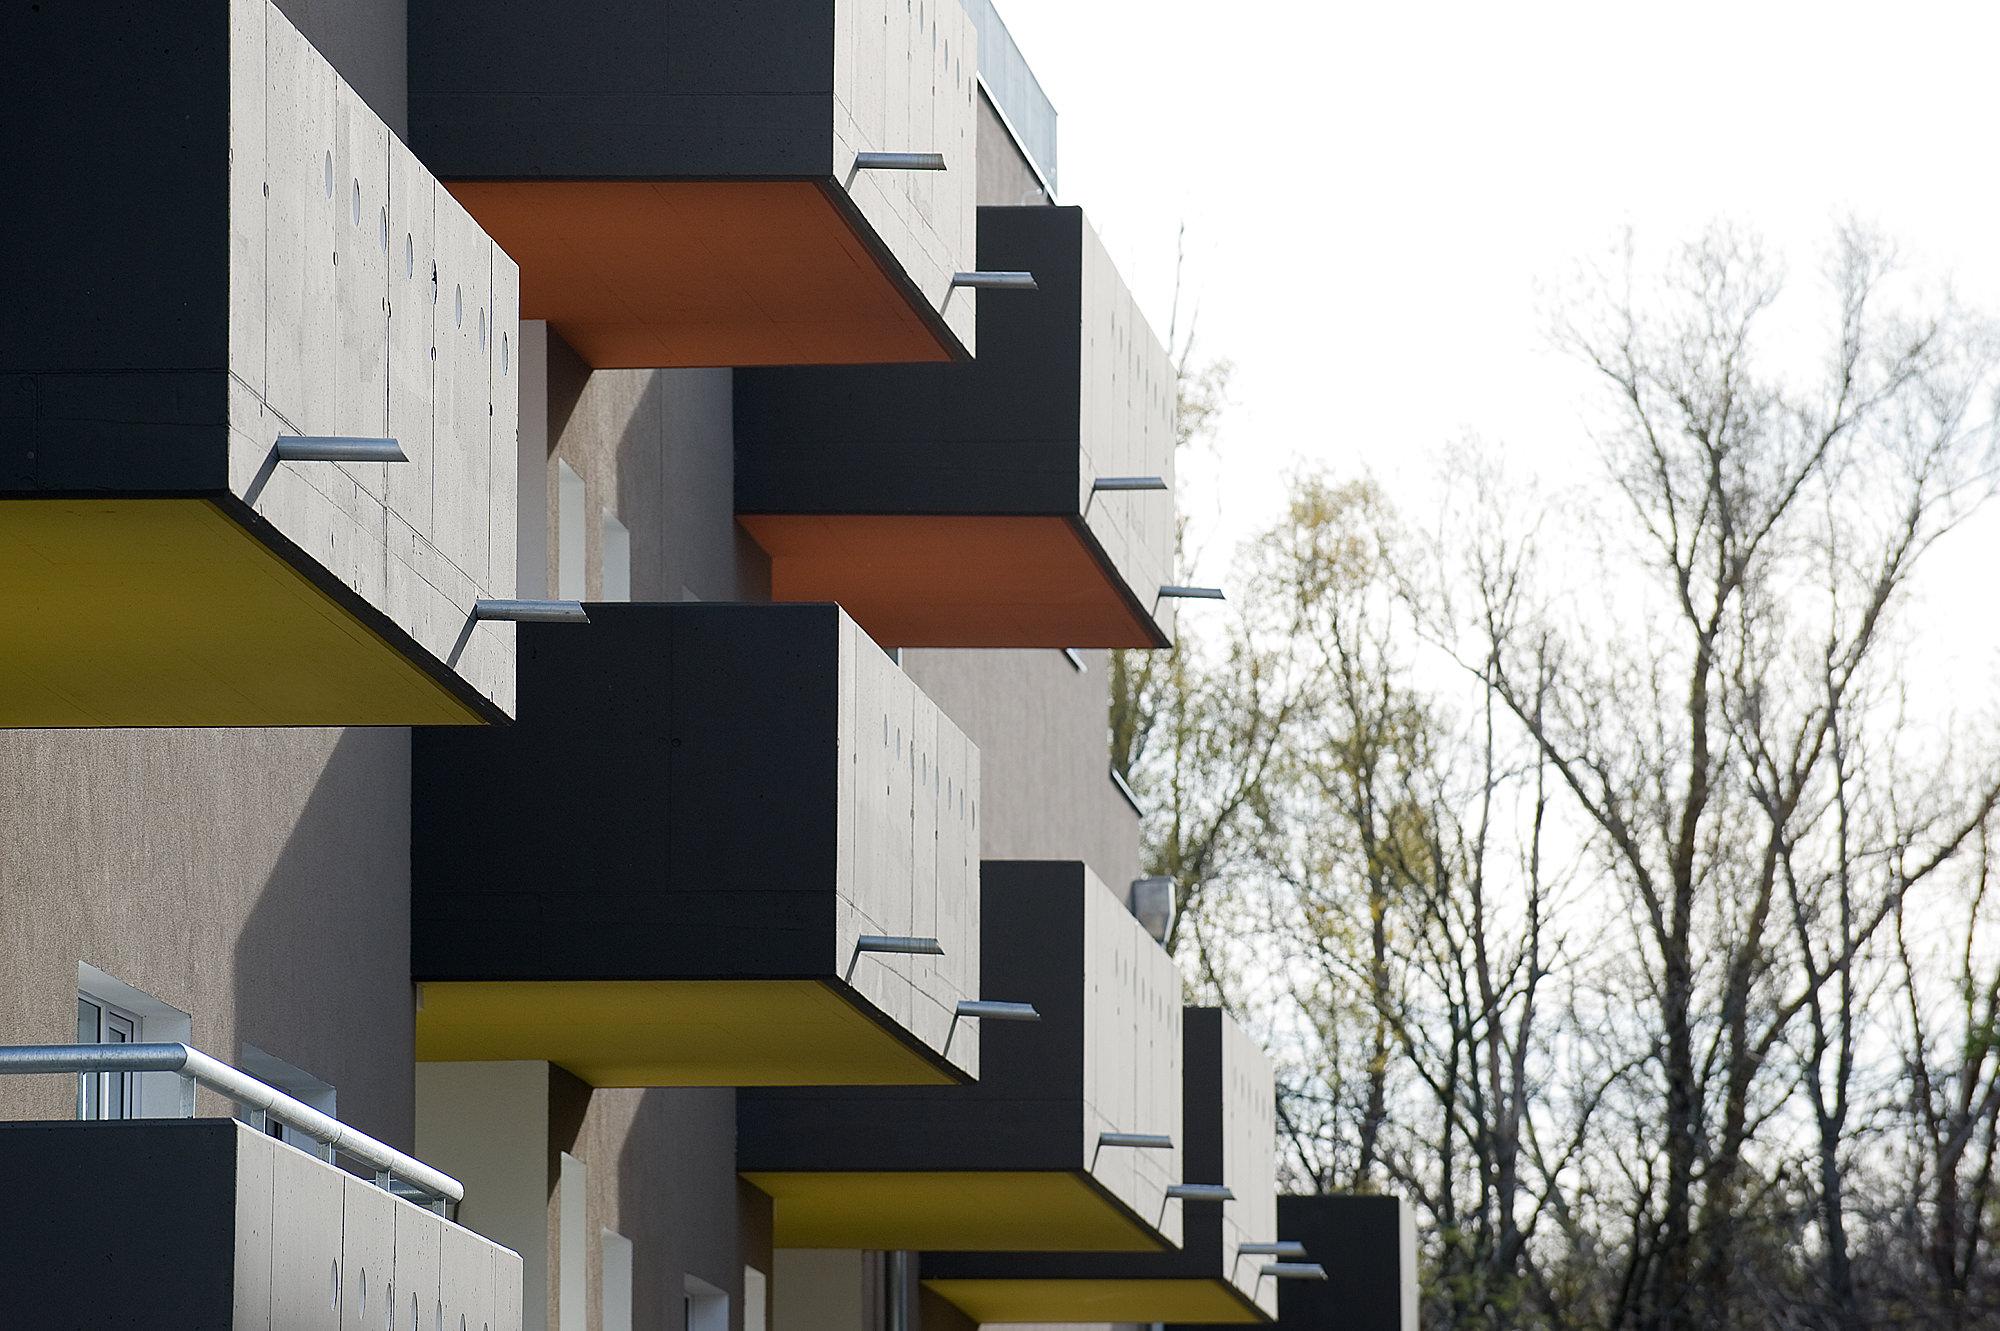 moselgasse 01 wohnbau 1100 wien junger beer architektur